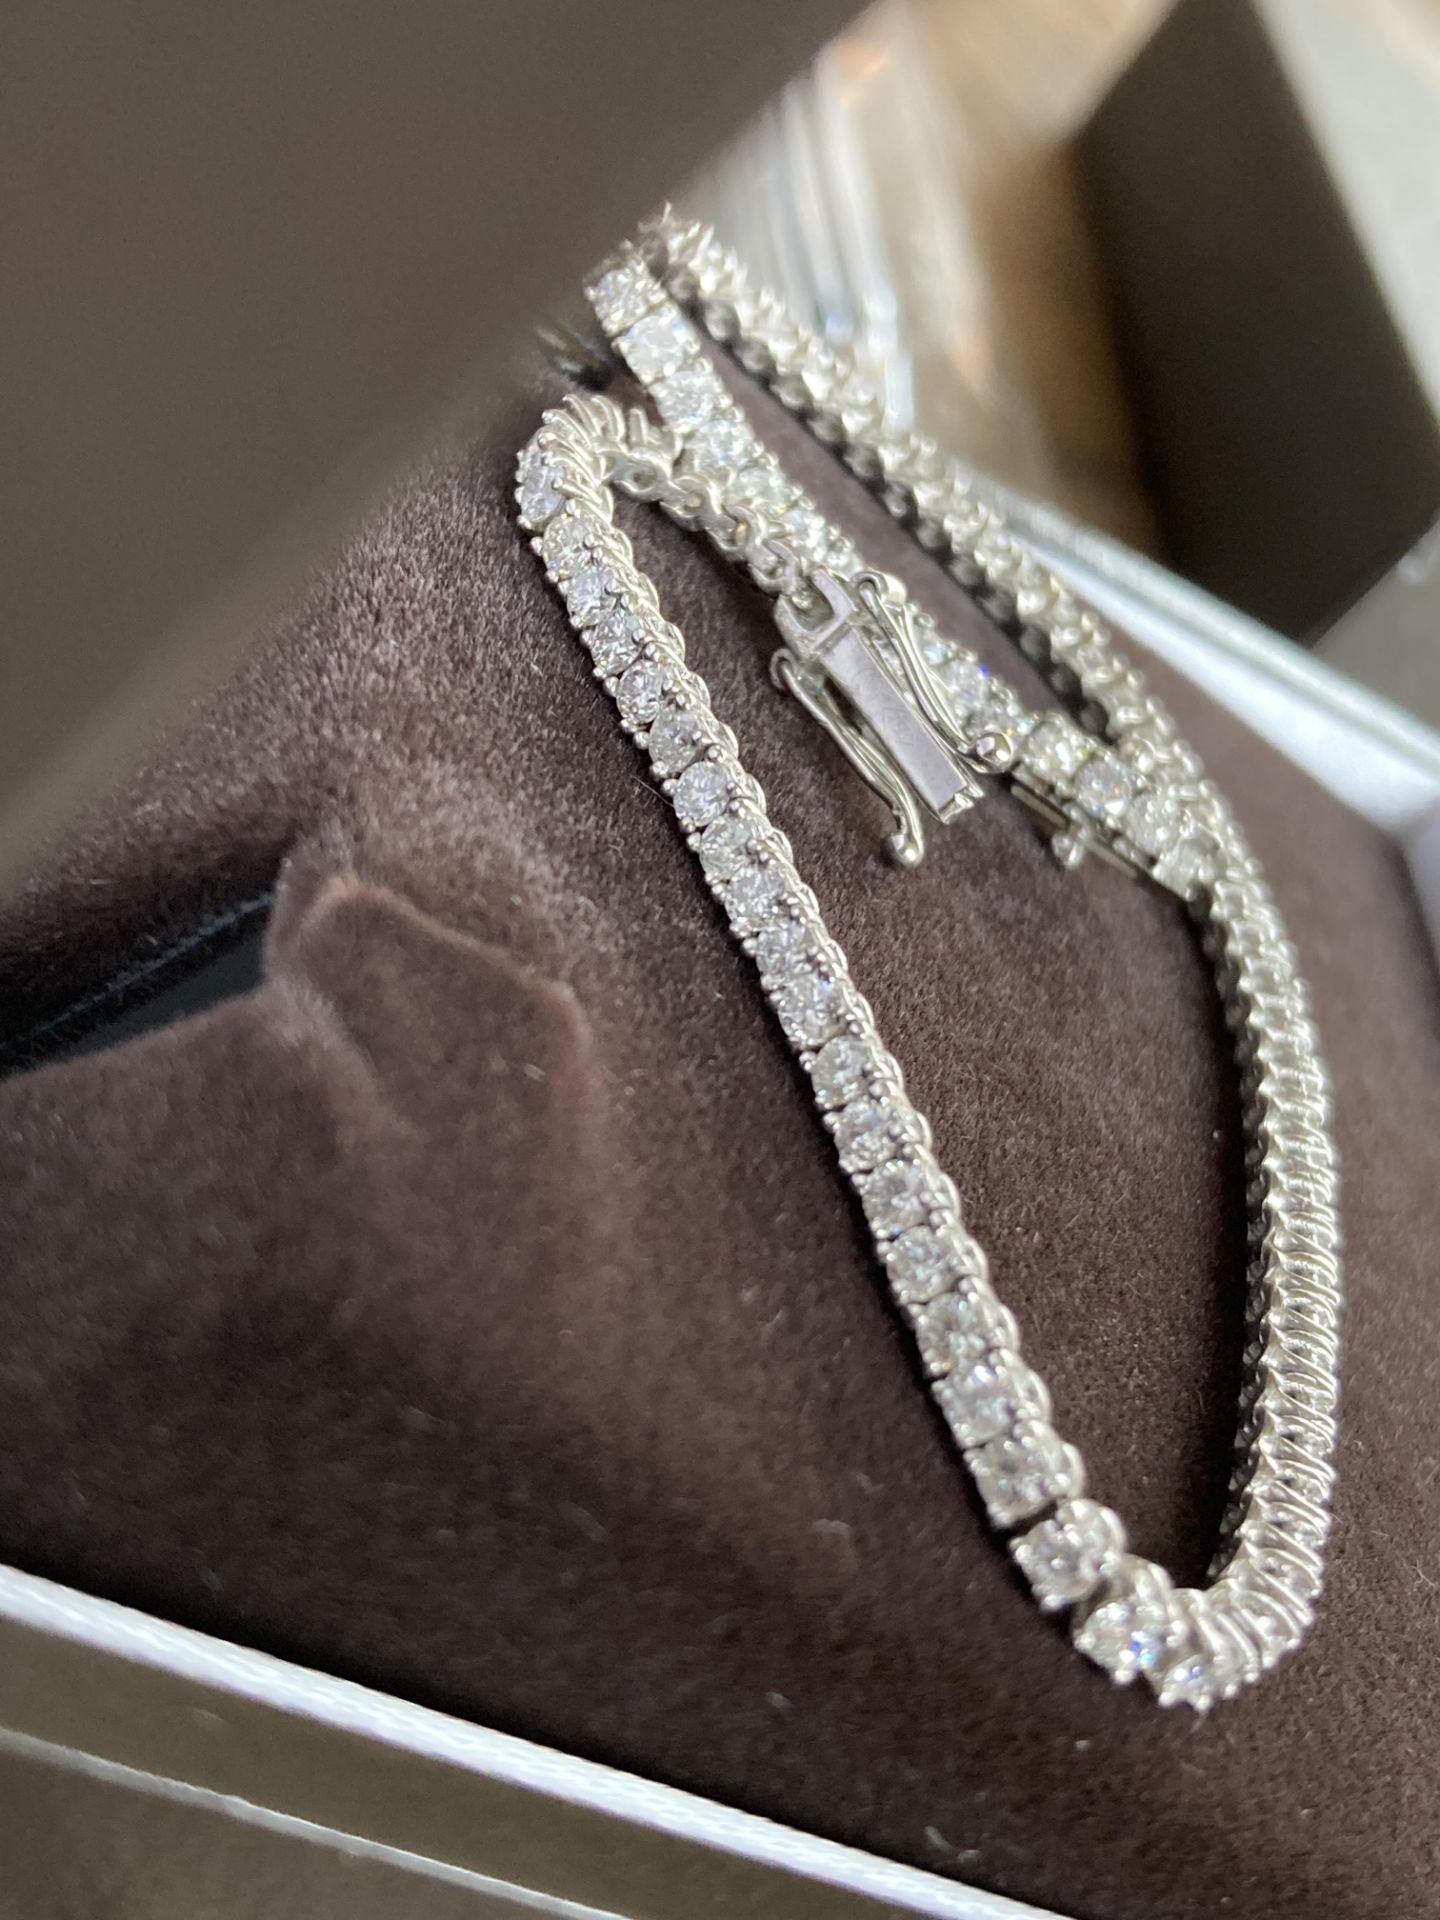 18CT WHITE GOLD 3.2-3.5CT DIAMOND TENNIS BRACELET - Image 2 of 4